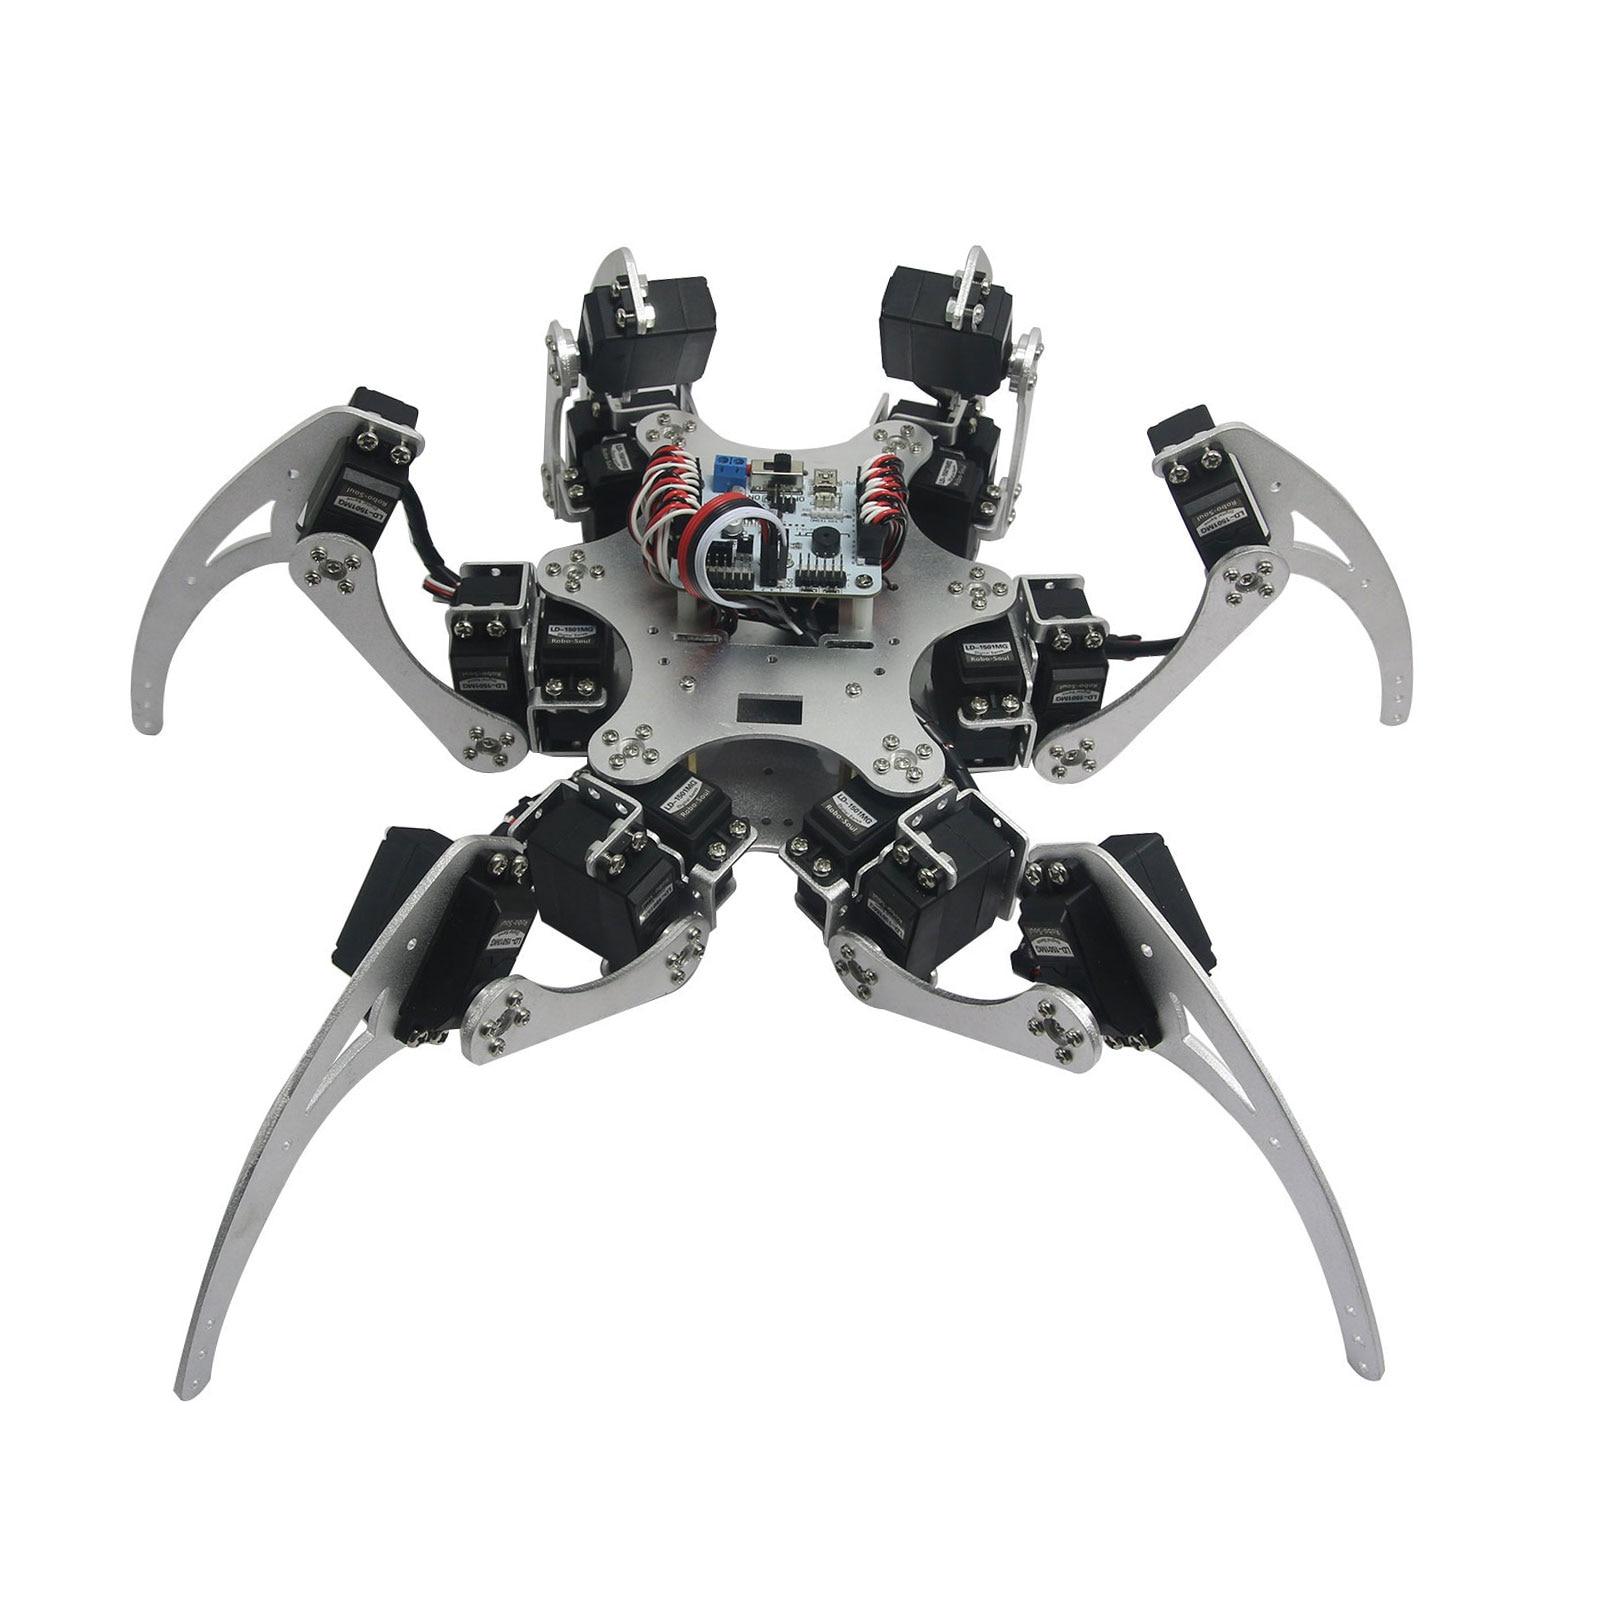 Aluminium robotic hexapod spider six dof legs robot frame